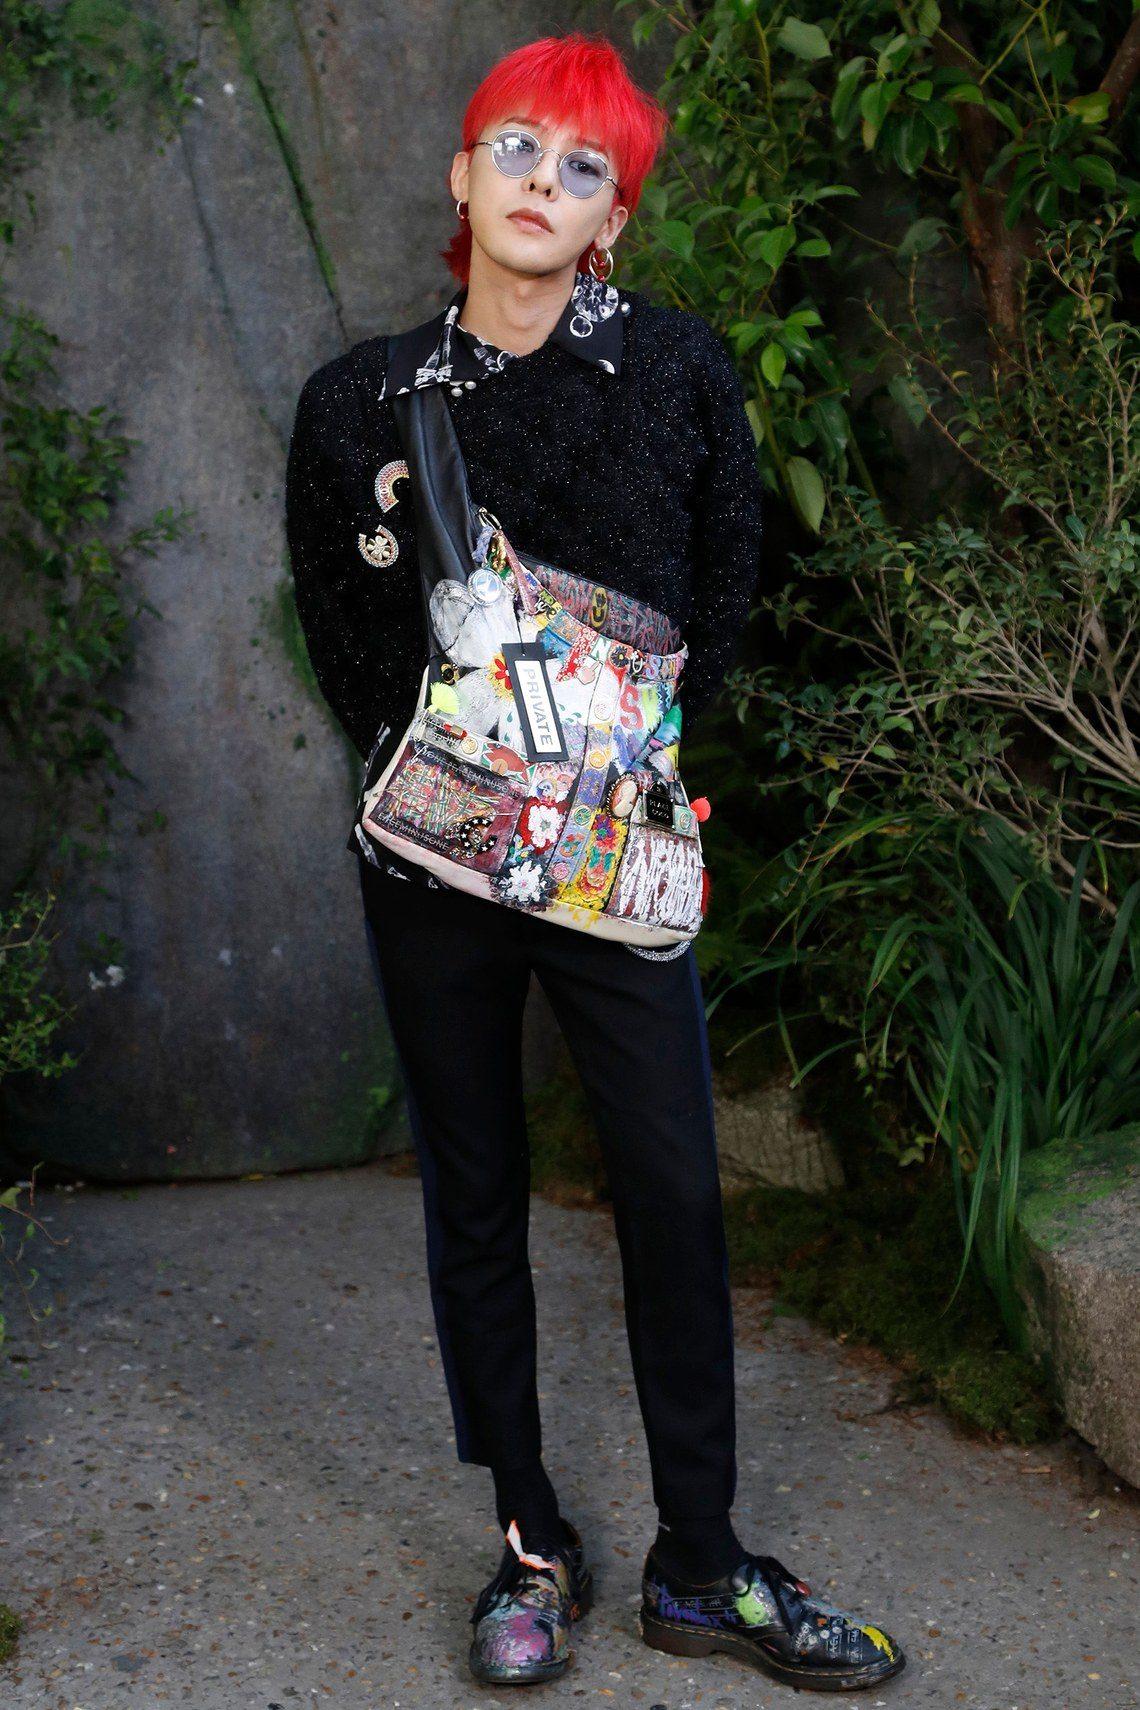 Vogue Praises G-Dragon For Wearing Women's Clothing and ...  Vogue Praises G...